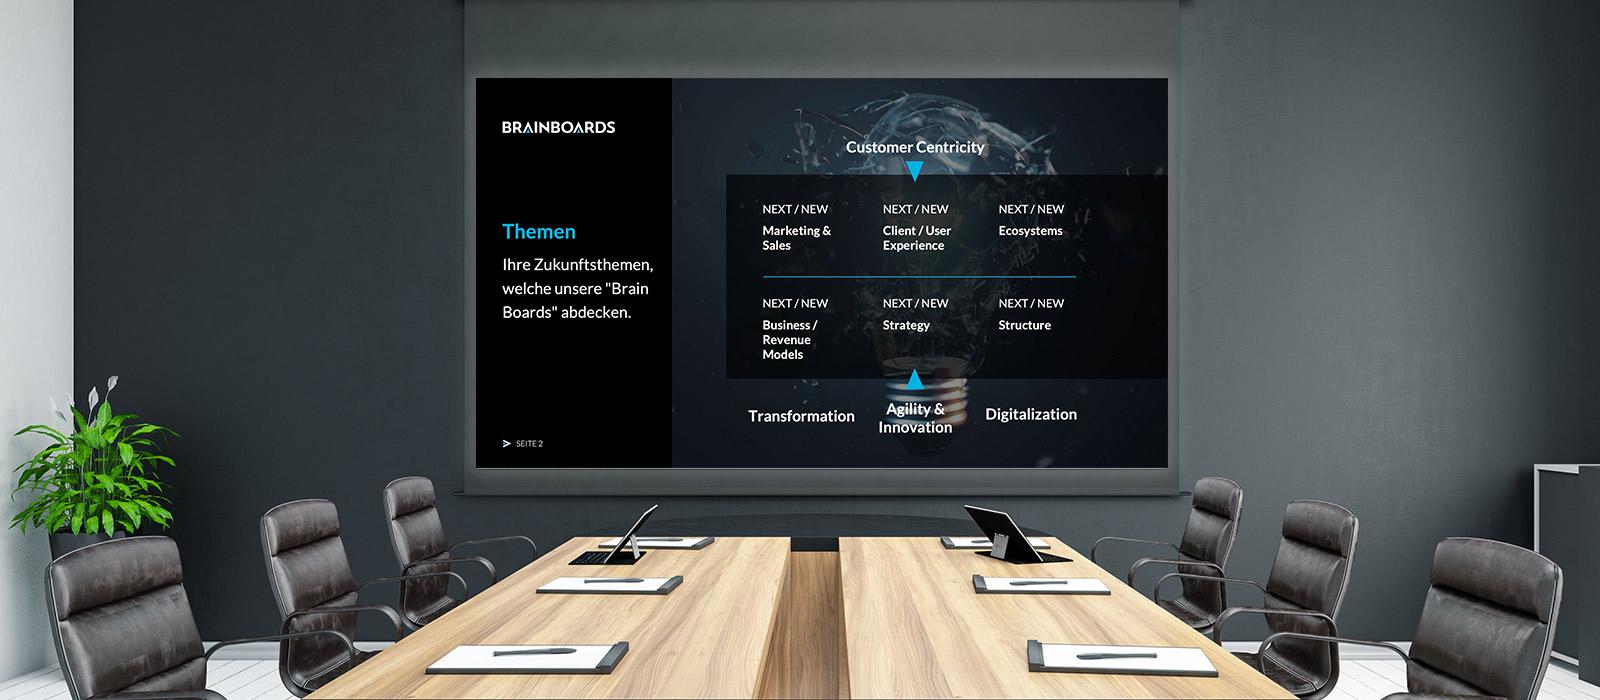 content-referenzen-details-brainboards-powerpoint-desktop